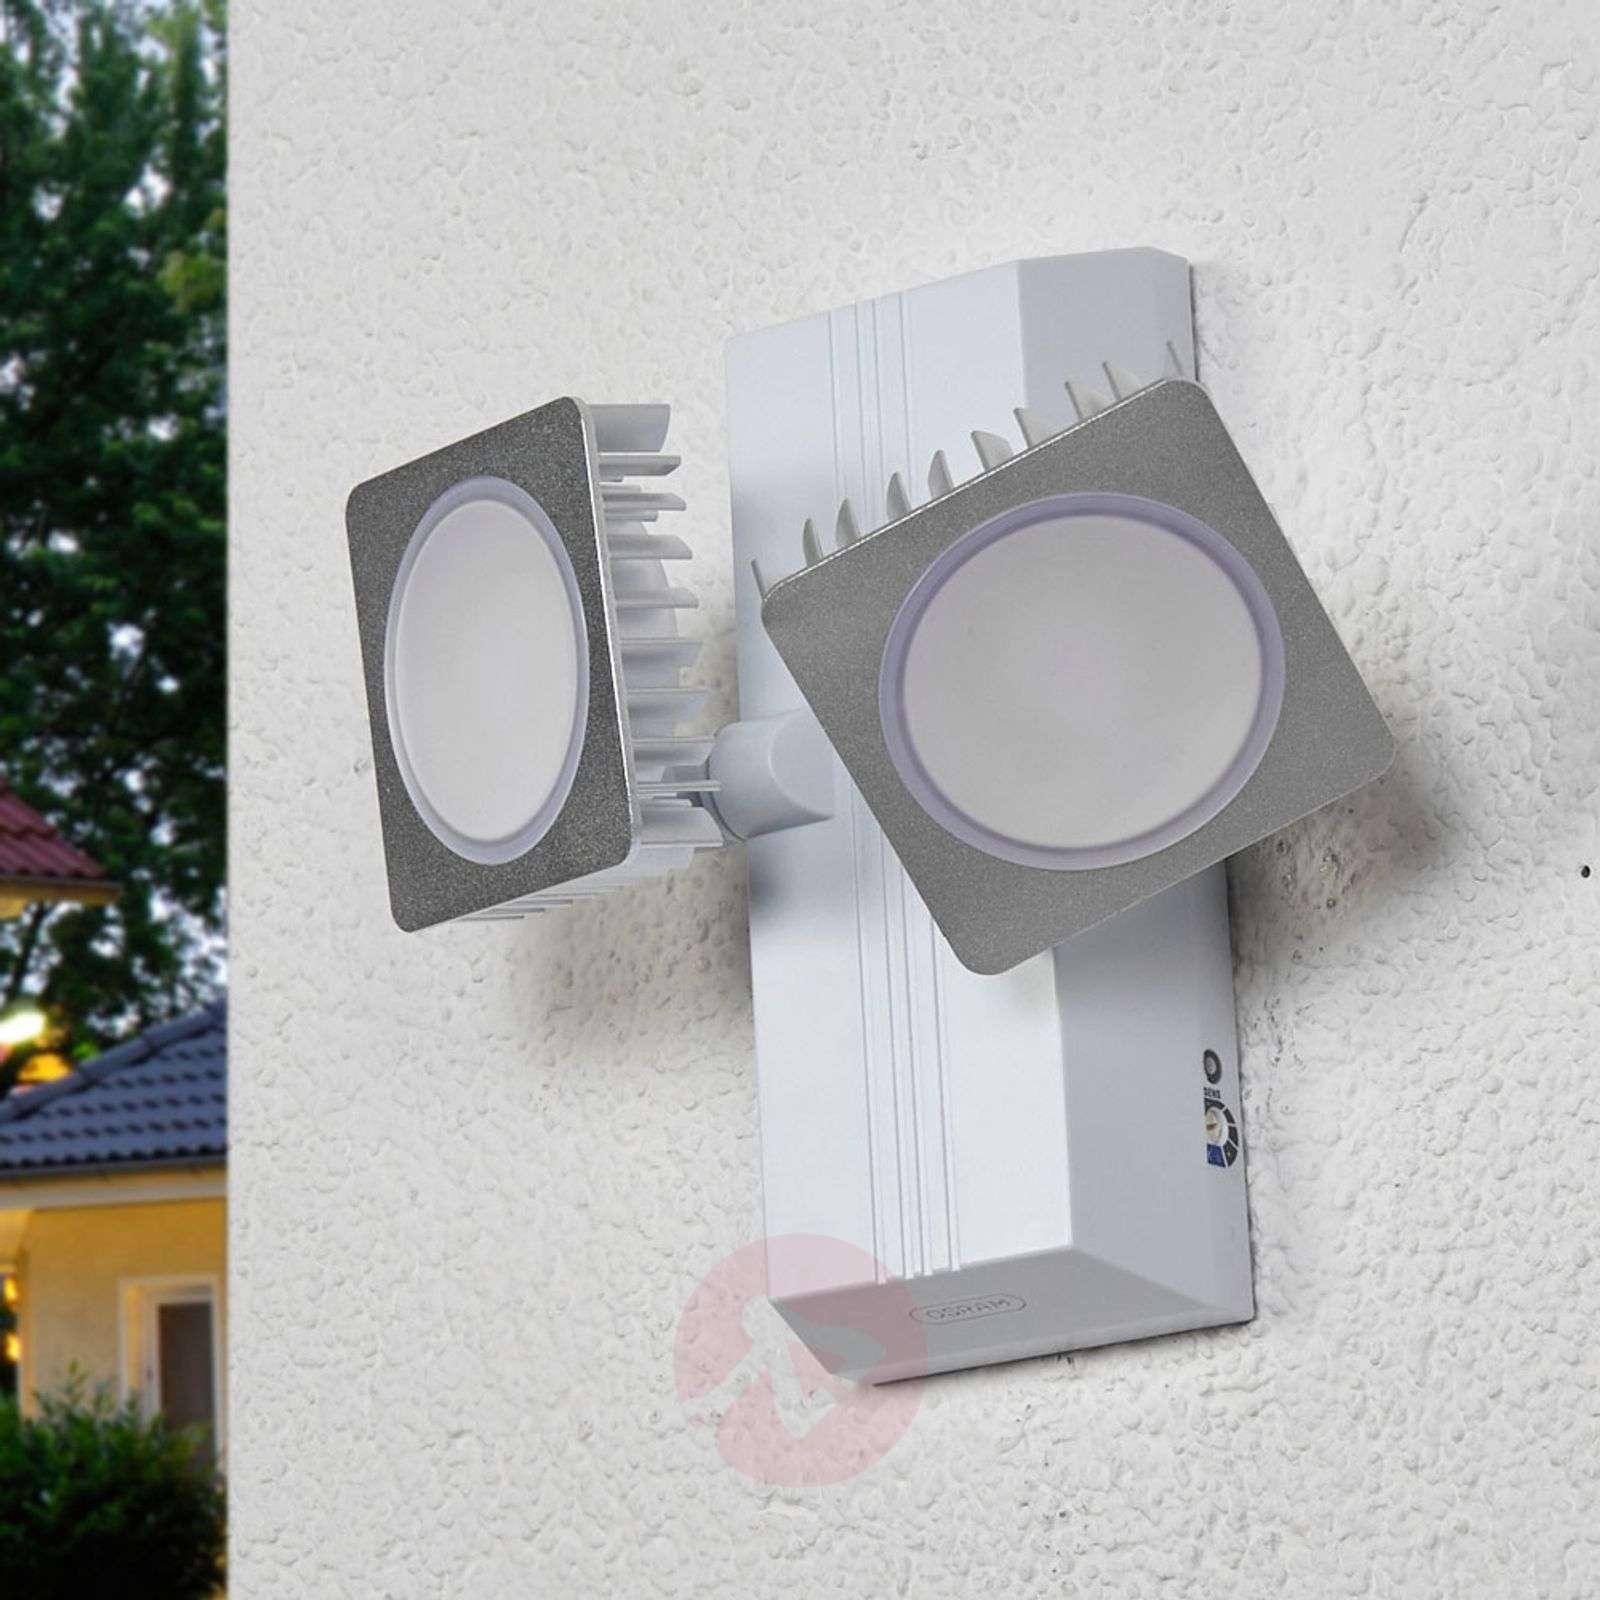 Double spot LED outdoor wall lamp Noxlite Smart-7261127-01